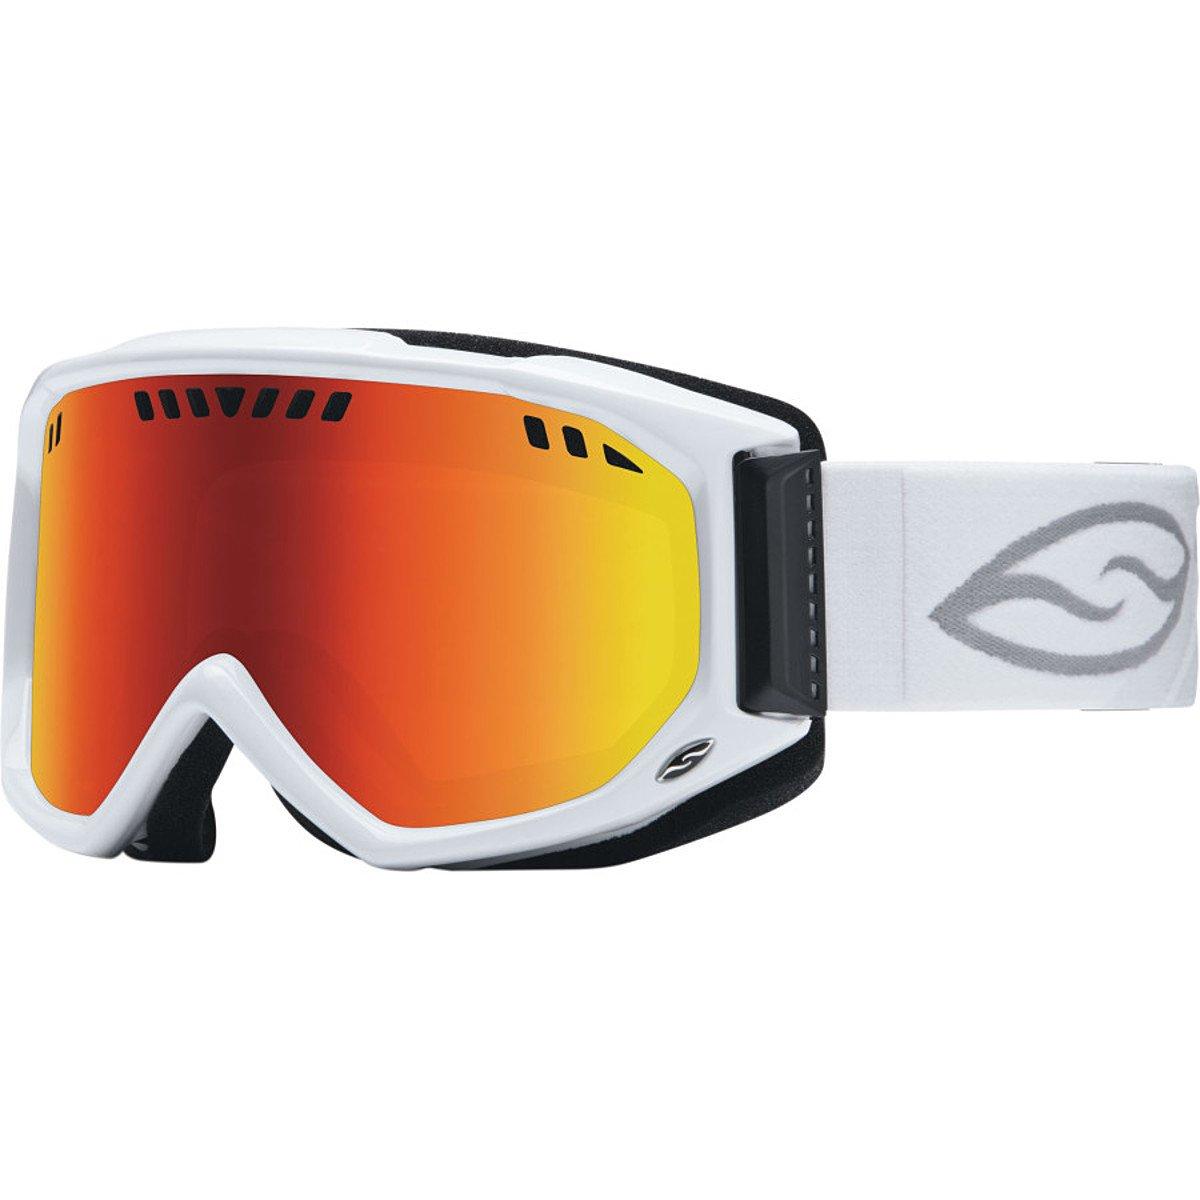 Smith Optics Scope Airflow Series Winter Sport